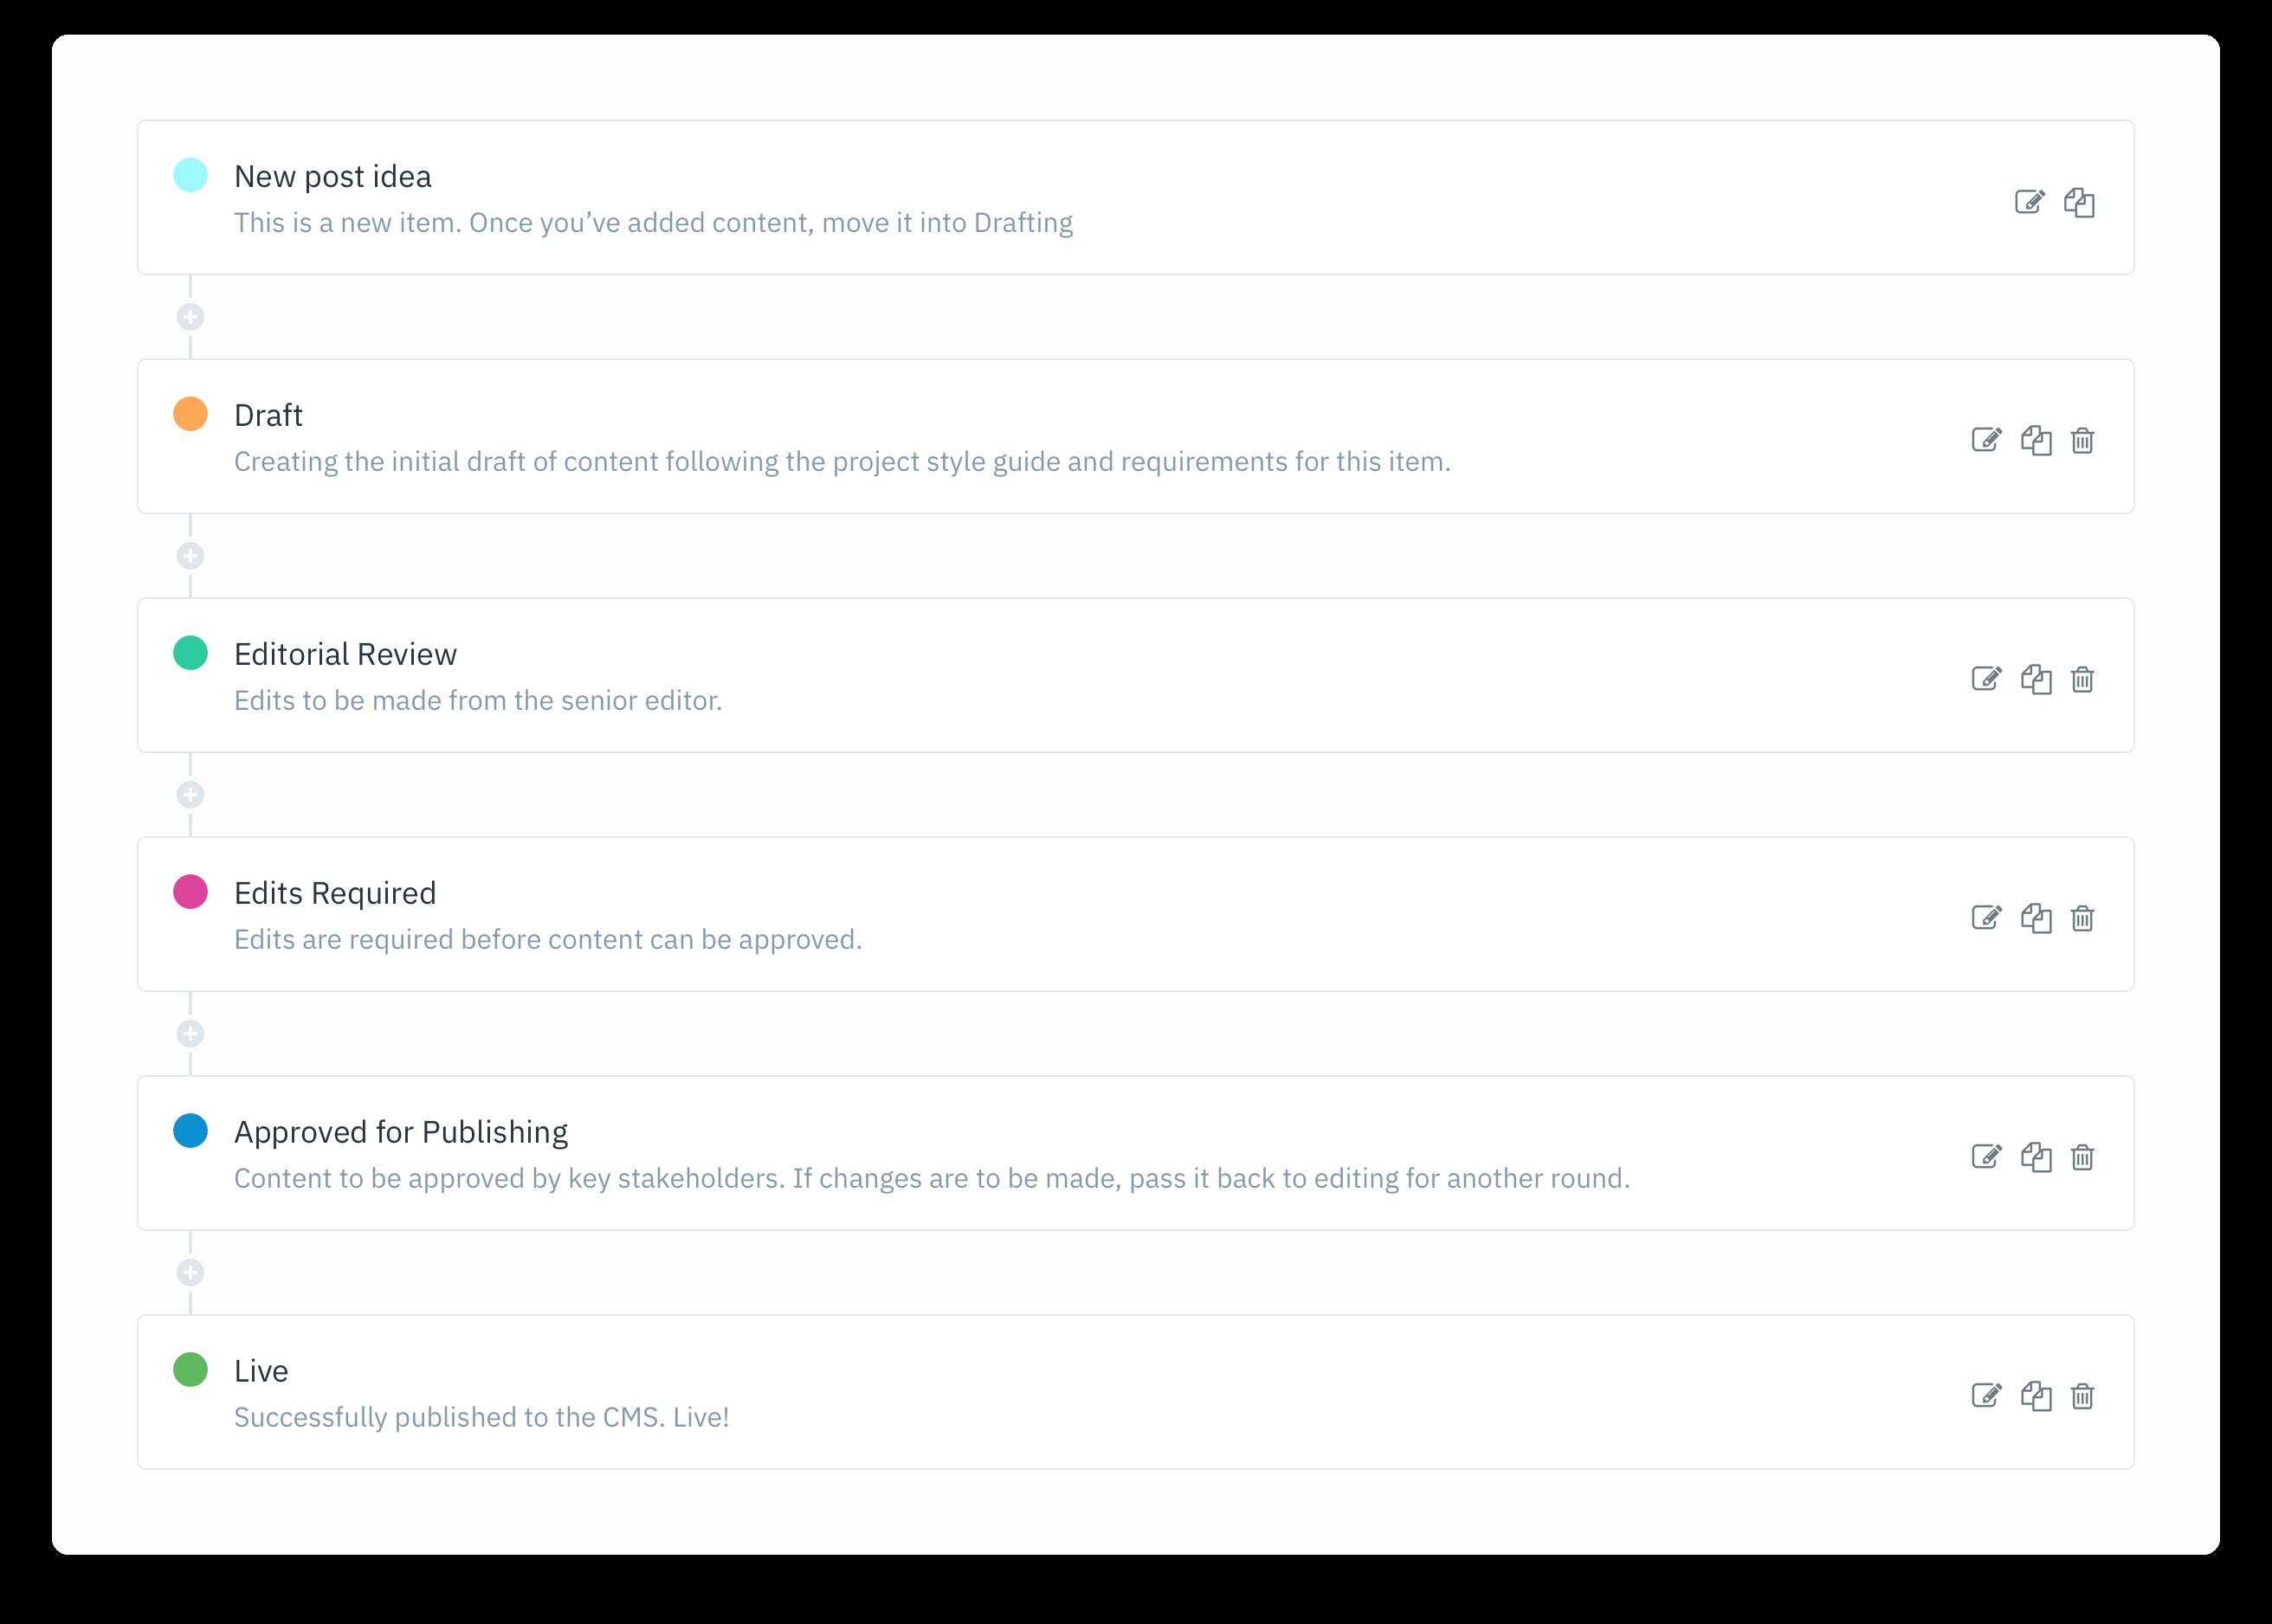 GatherContent Blog Post Content Workflow